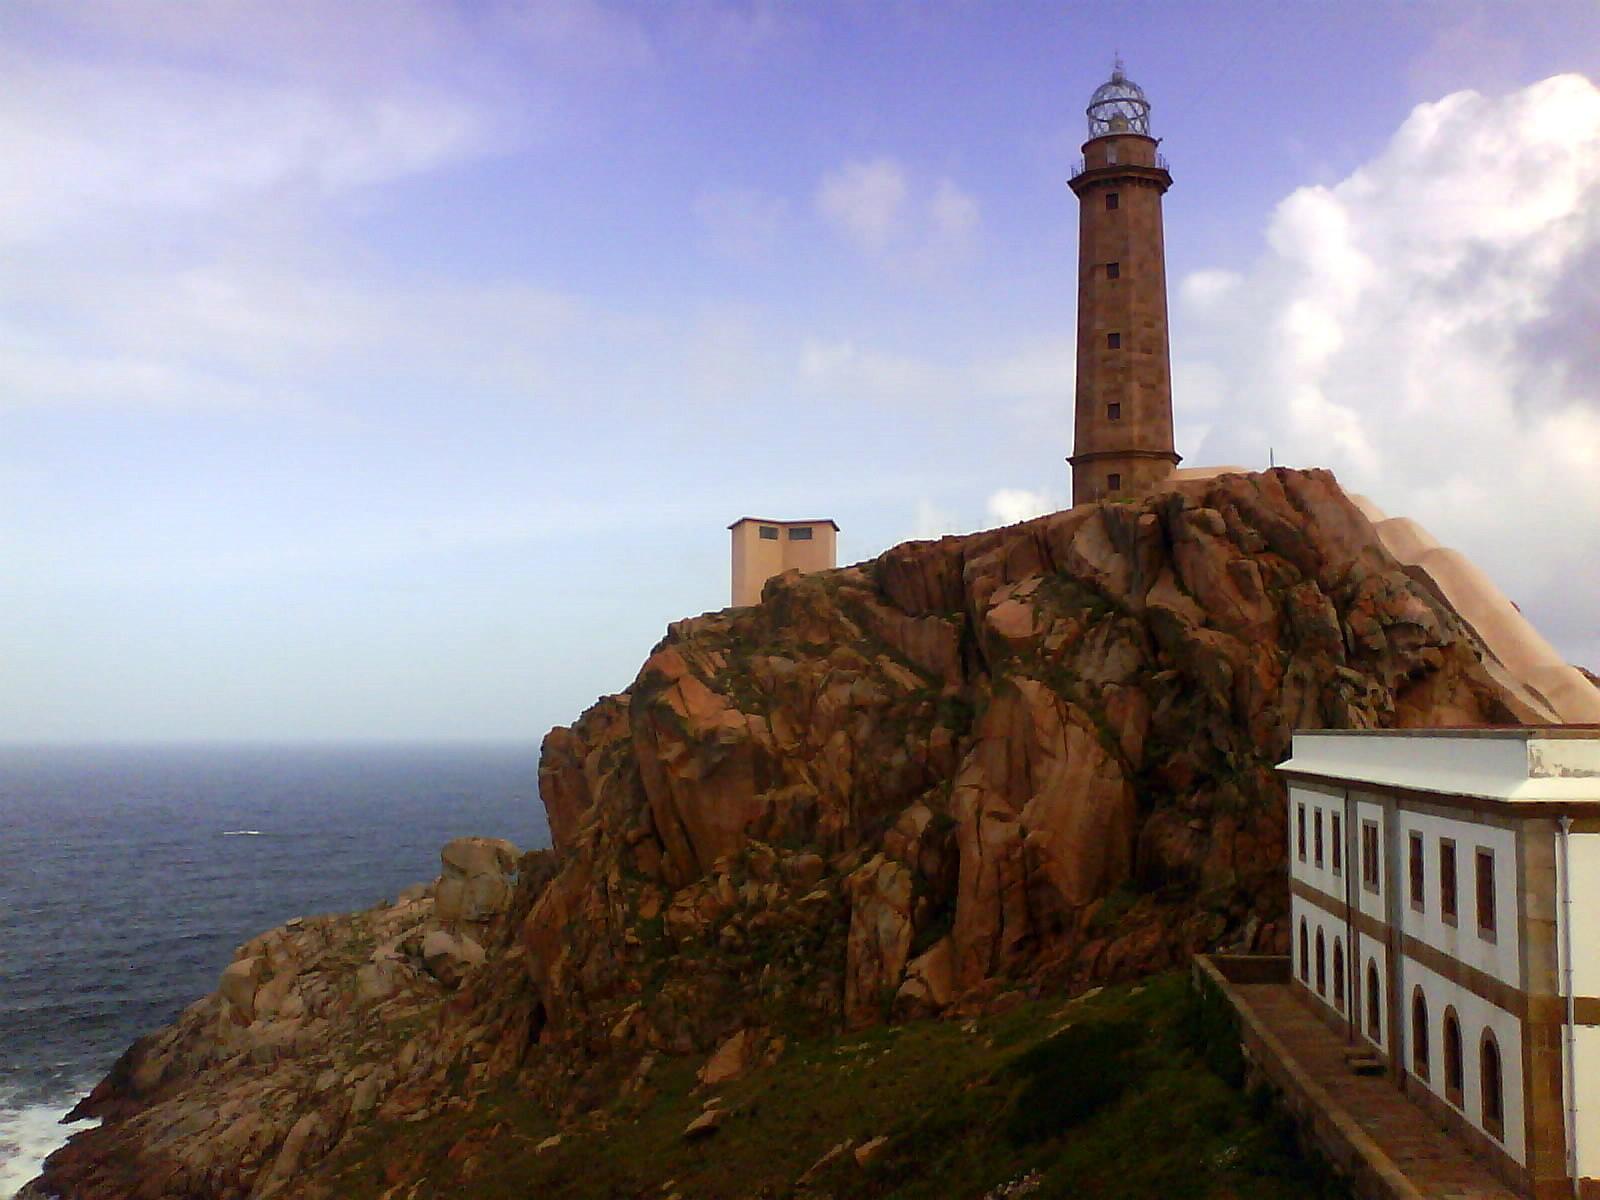 http://upload.wikimedia.org/wikipedia/commons/9/9c/Cabo_Vil%C3%A1n._Camari%C3%B1as._Galiza.jpg